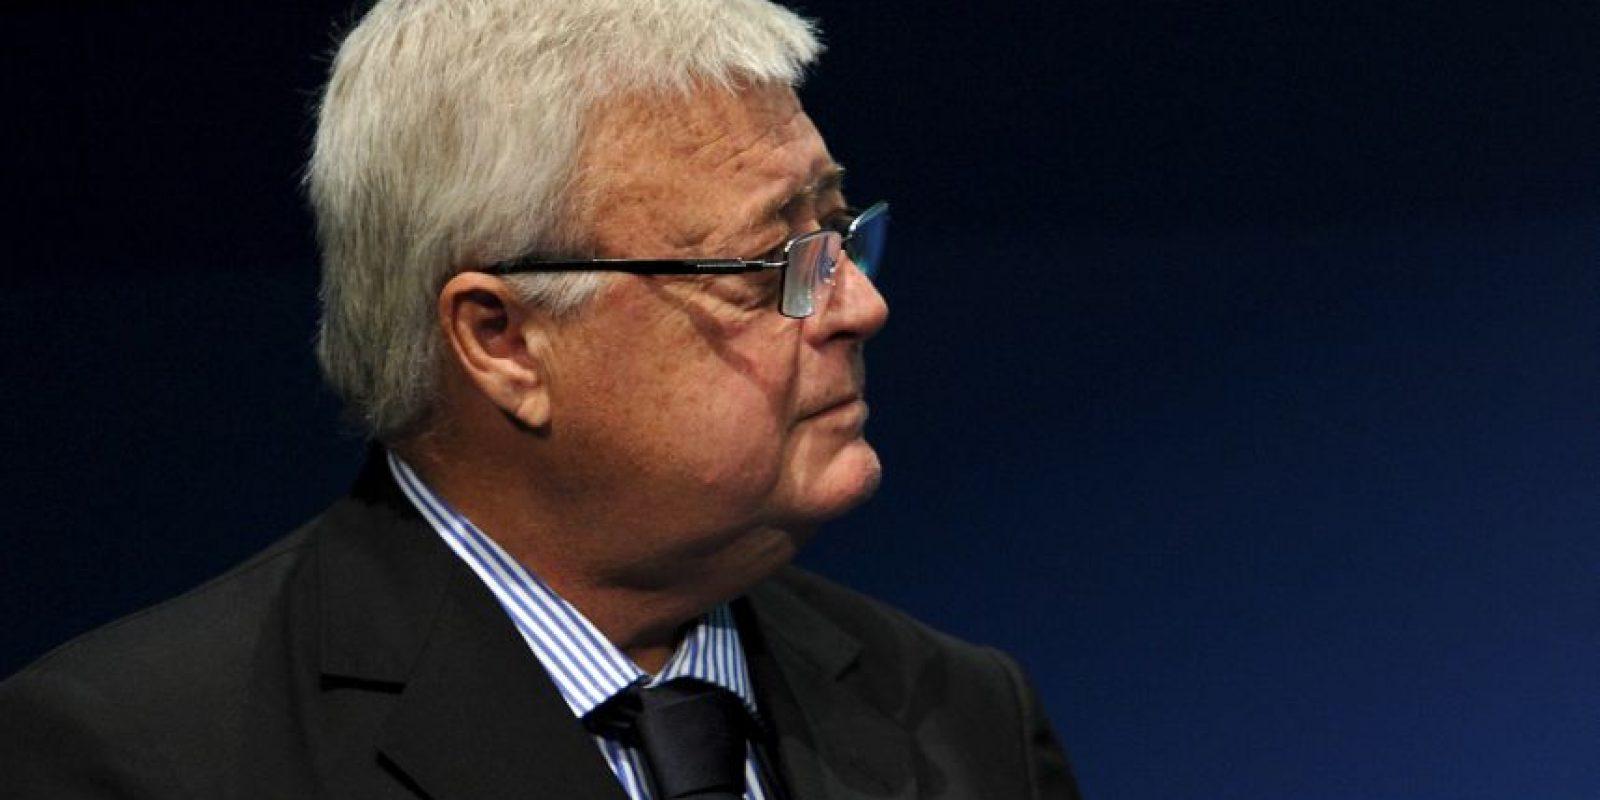 Ricardo Teixeira. Brasileño, presidente Confederación Brasileña de Fútbol desde 1989 hasta 2012, fue reemplazado por José Maria Marín Foto:Getty Images